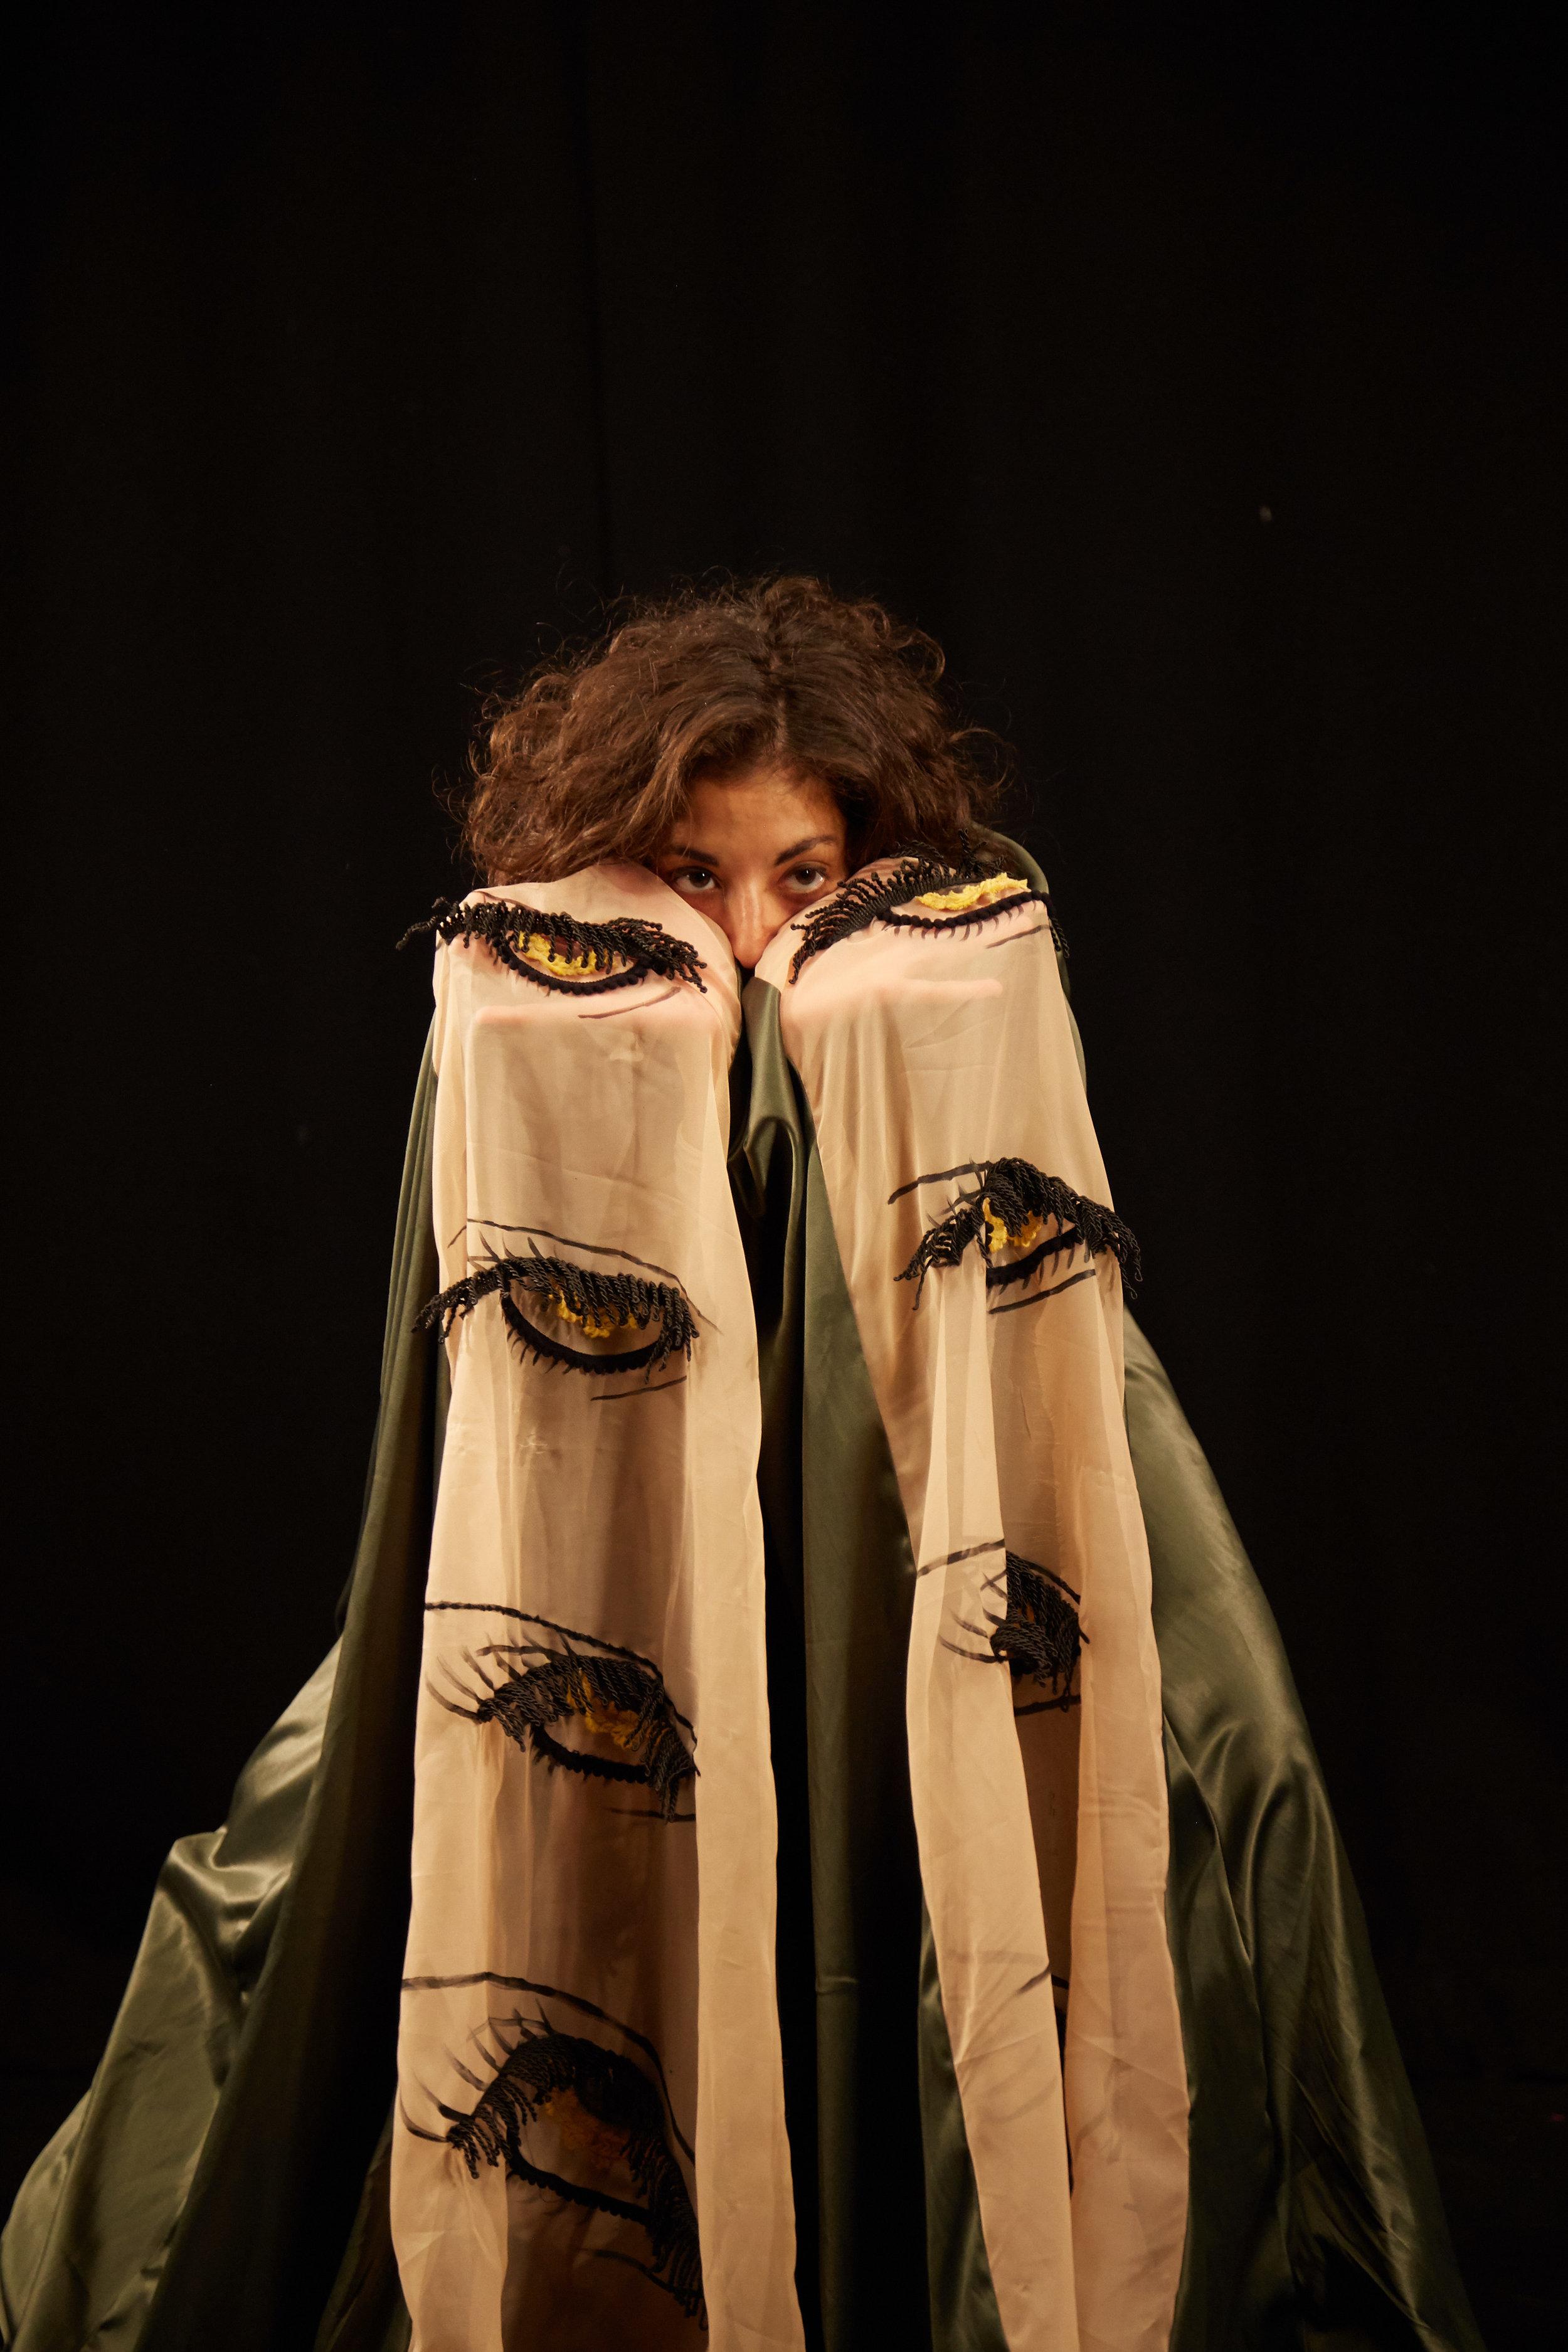 180123_MA_Costume_Design_Isabehella_Lima_0951.jpg